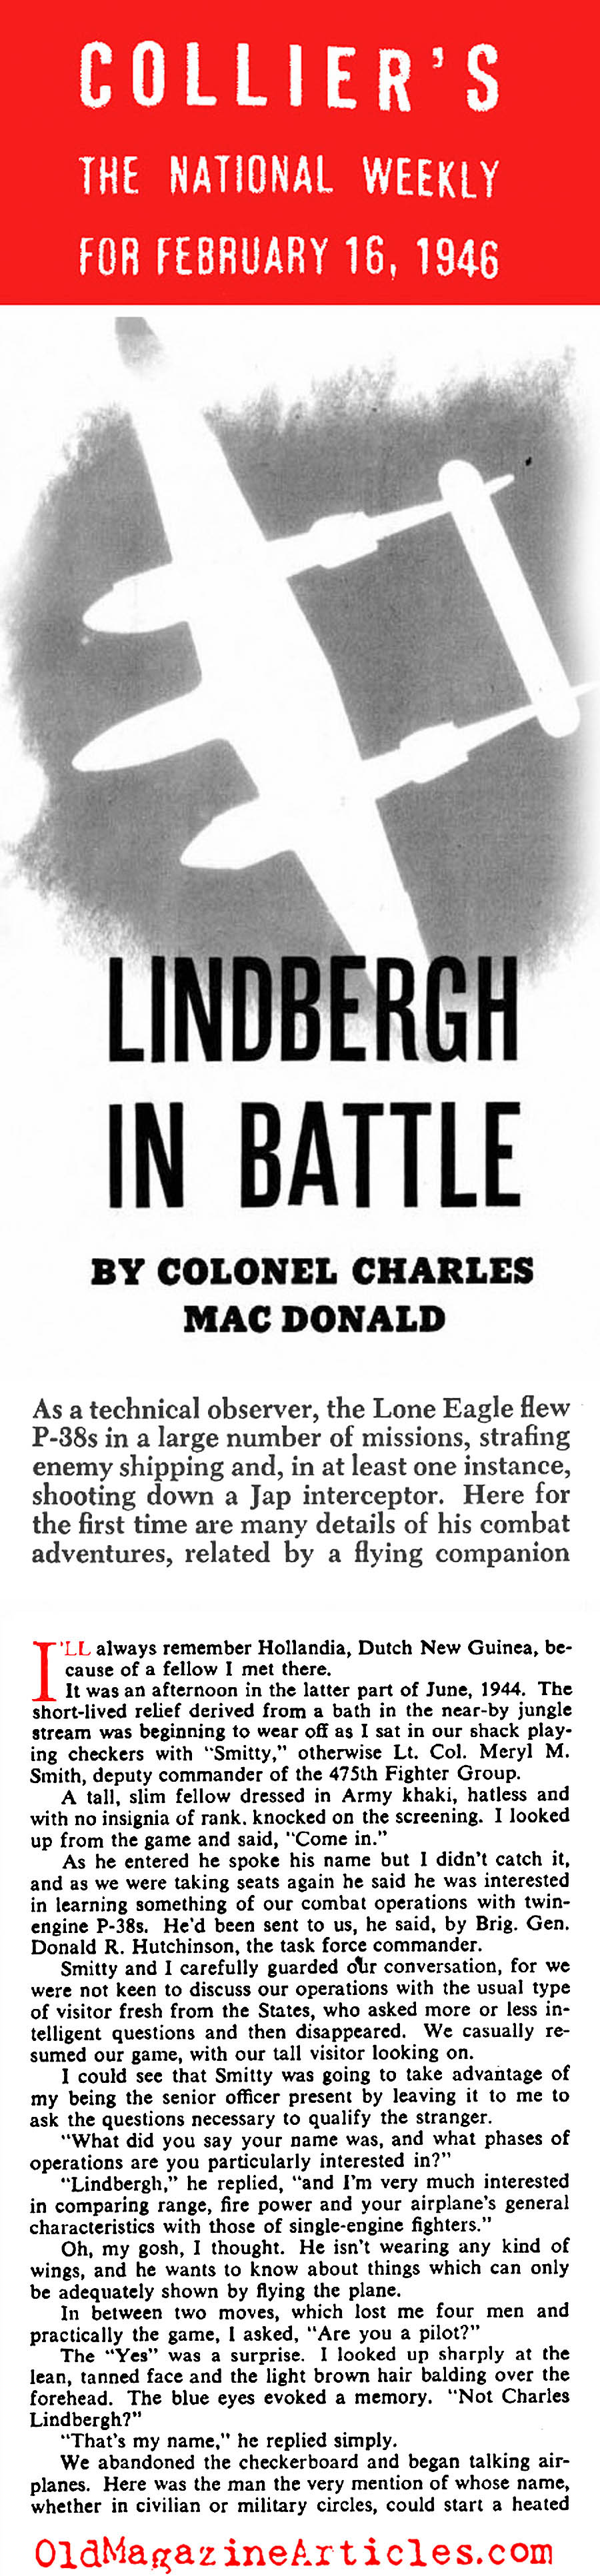 Lindbergh mannheim single party